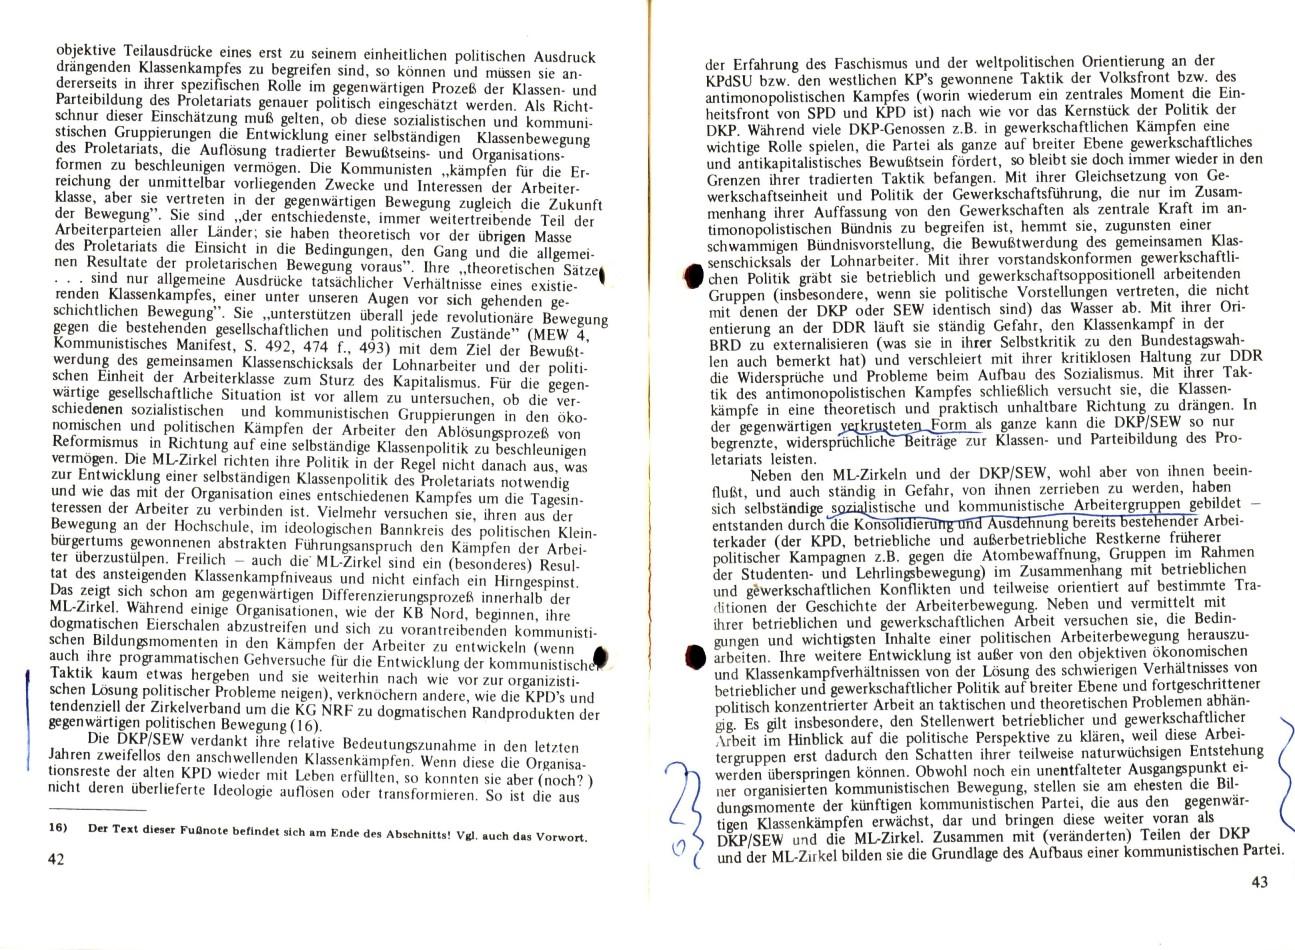 Berlin_KBML_Kommunist_1973_04s_23